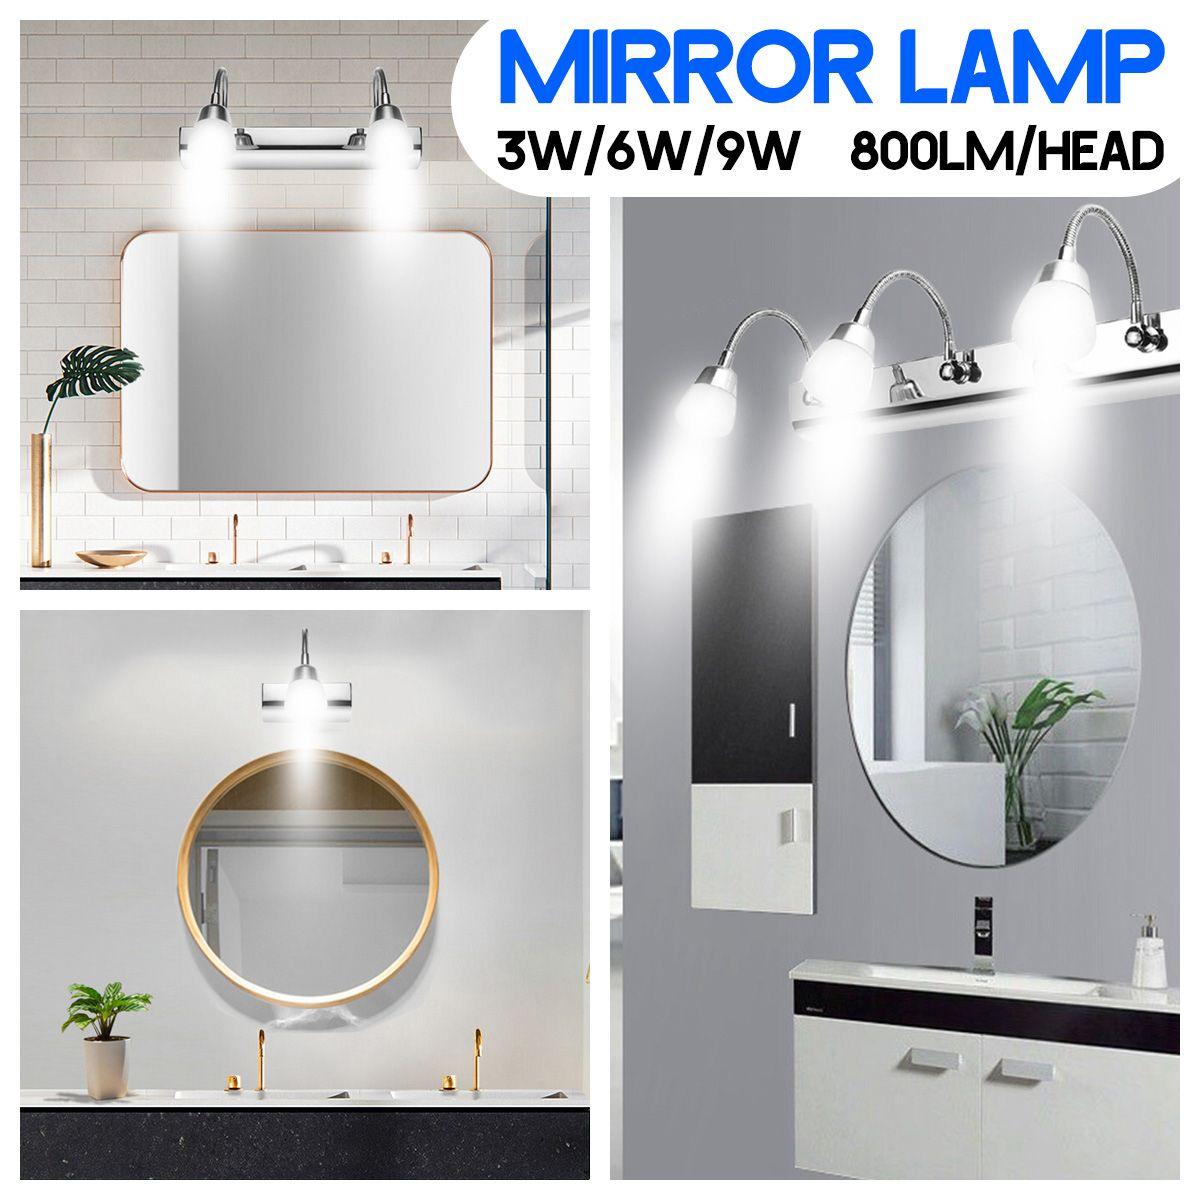 3W/6W/9W LED Bathroom Mirror Front Light Wall Lamp Makeup Vanity Light Waterproof Decorative Lamp Fixture Home Decor Lighting